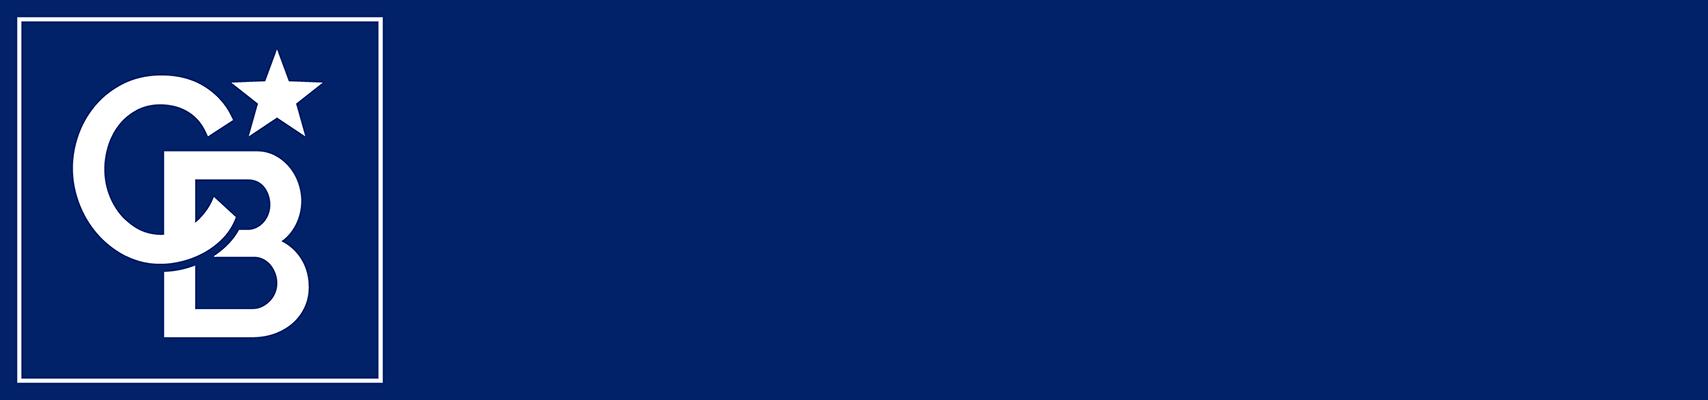 Carol Berry - Coldwell Banker Select Logo